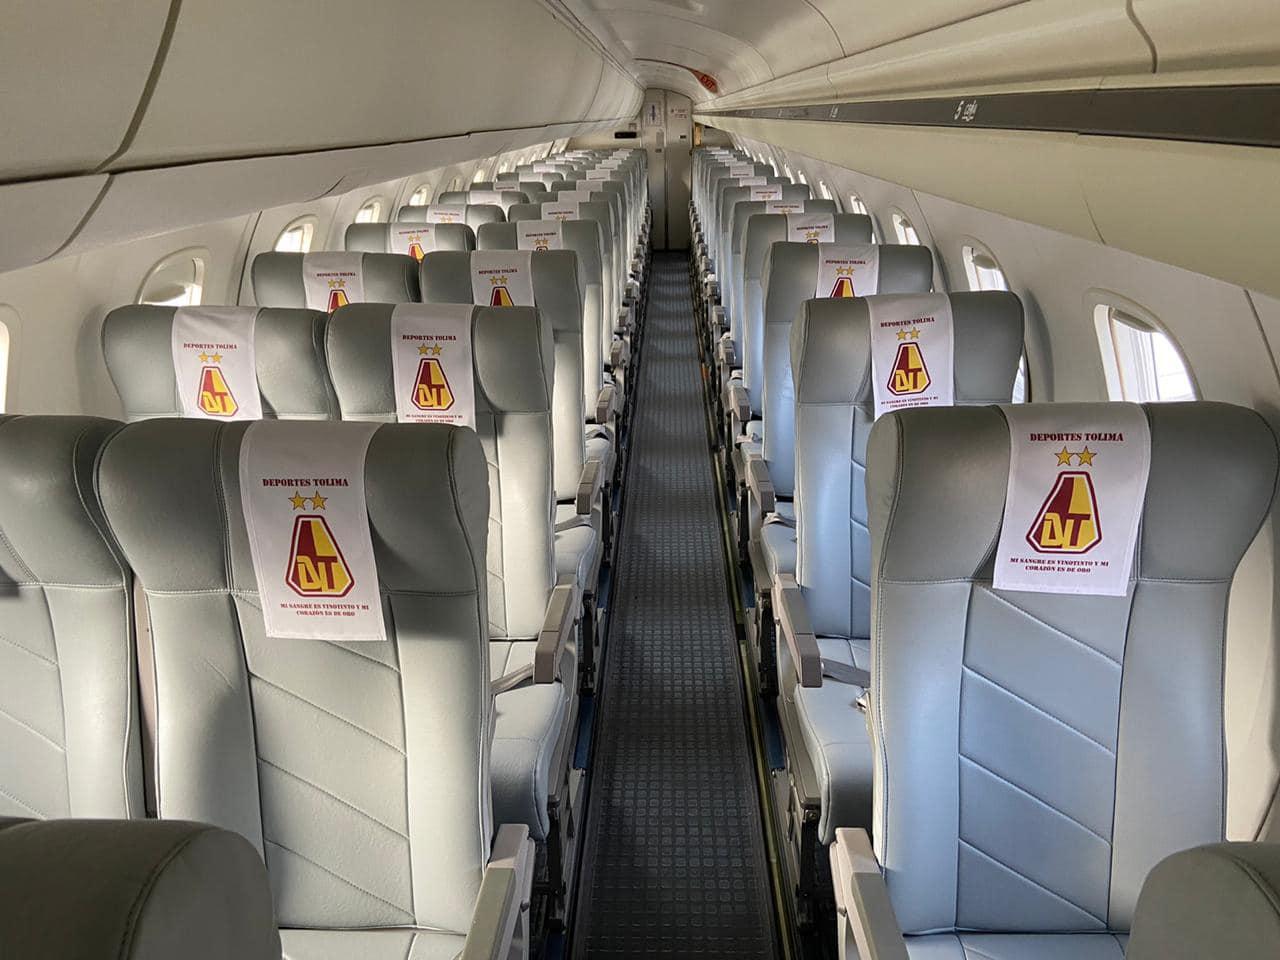 avion deportes tolima